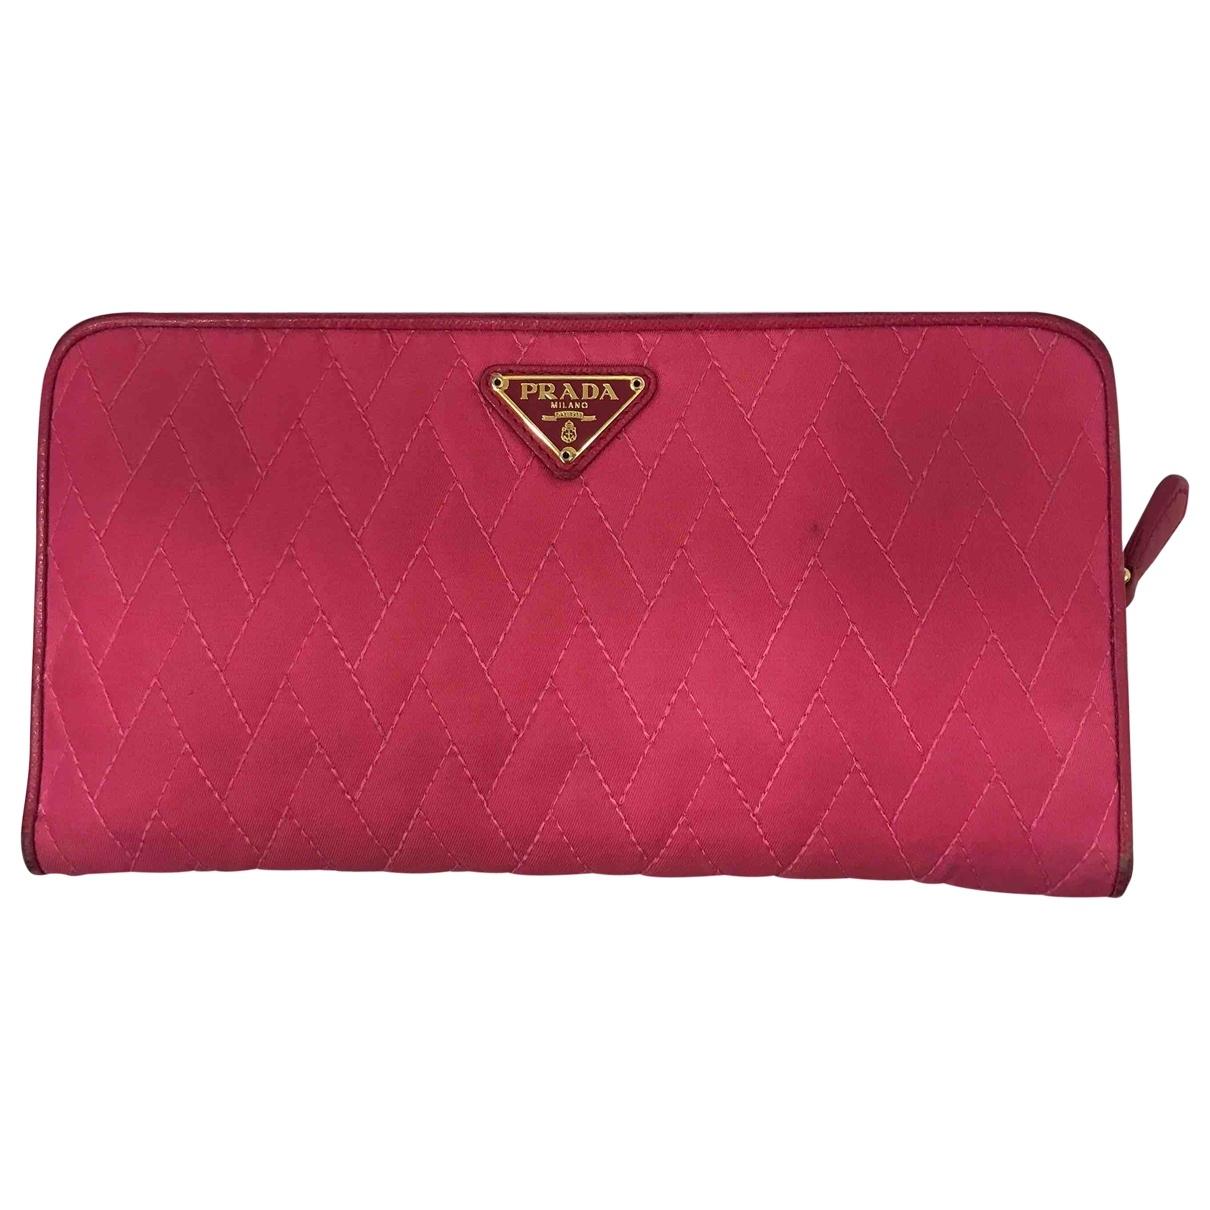 Prada - Portefeuille   pour femme en toile - rose